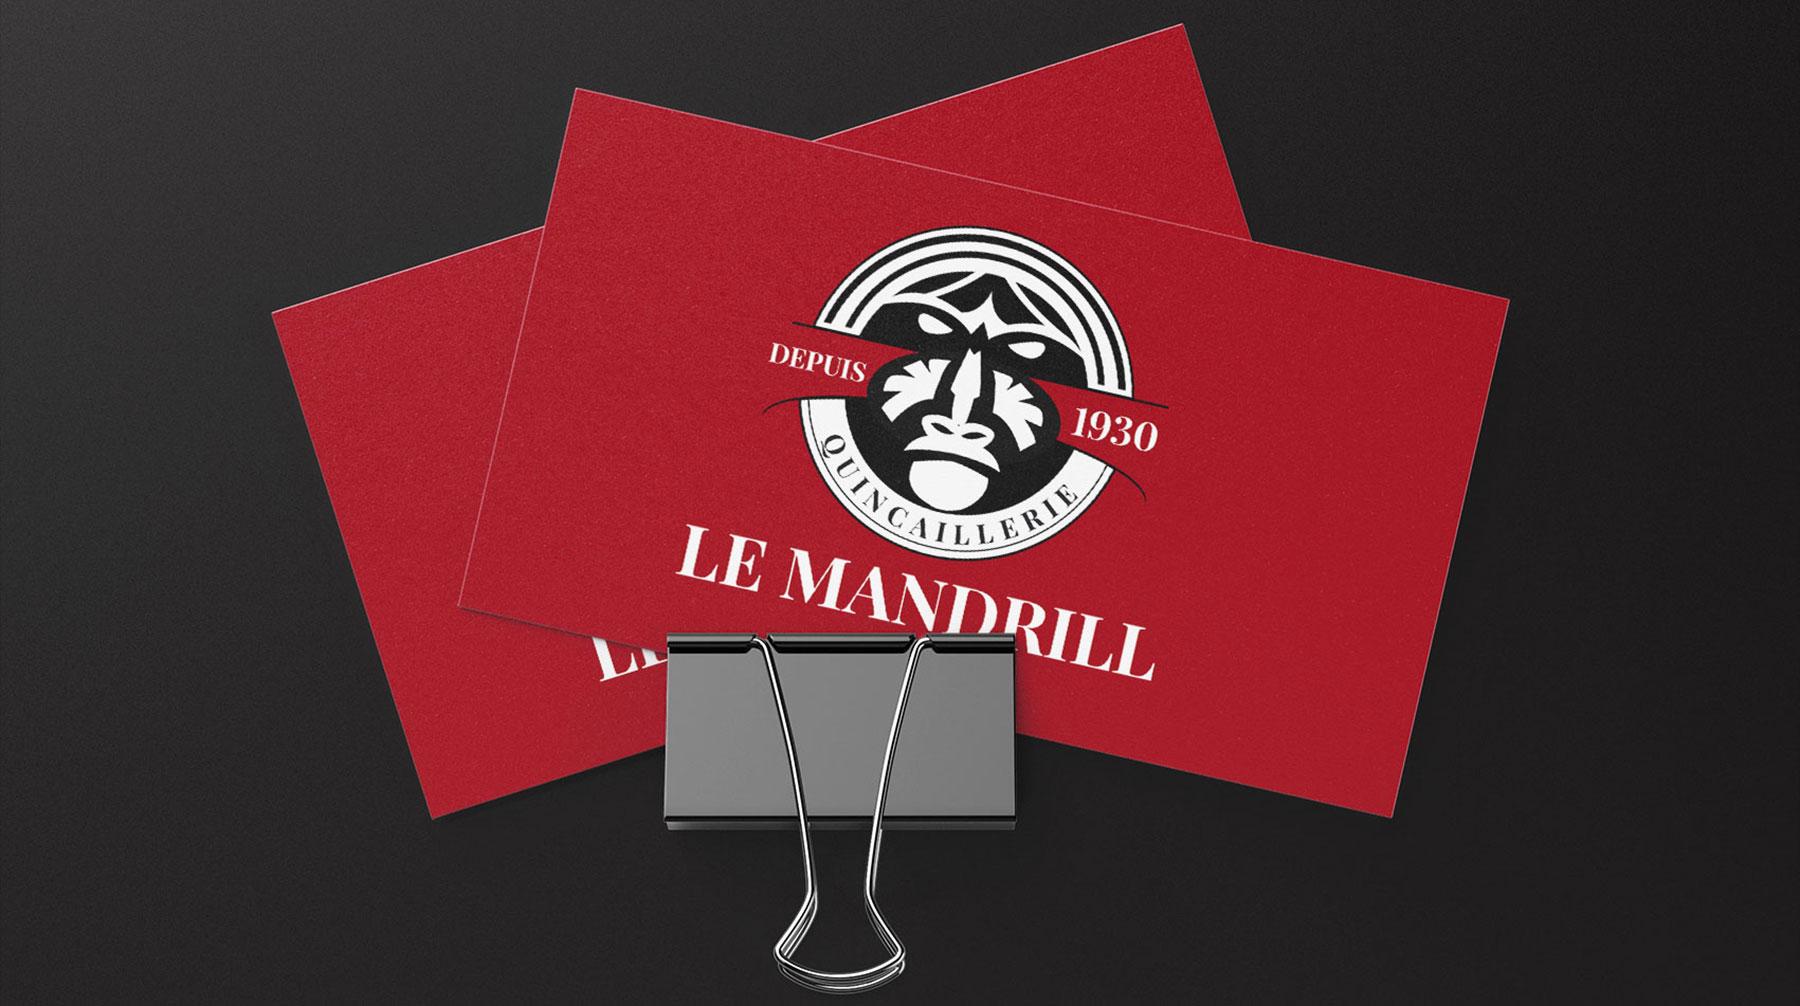 logo-SocieteLeMandrill-lemandrill-70- boulevardAlsaceLorraine-bayonne-commercedeproximite-drogueries-quincaillerie